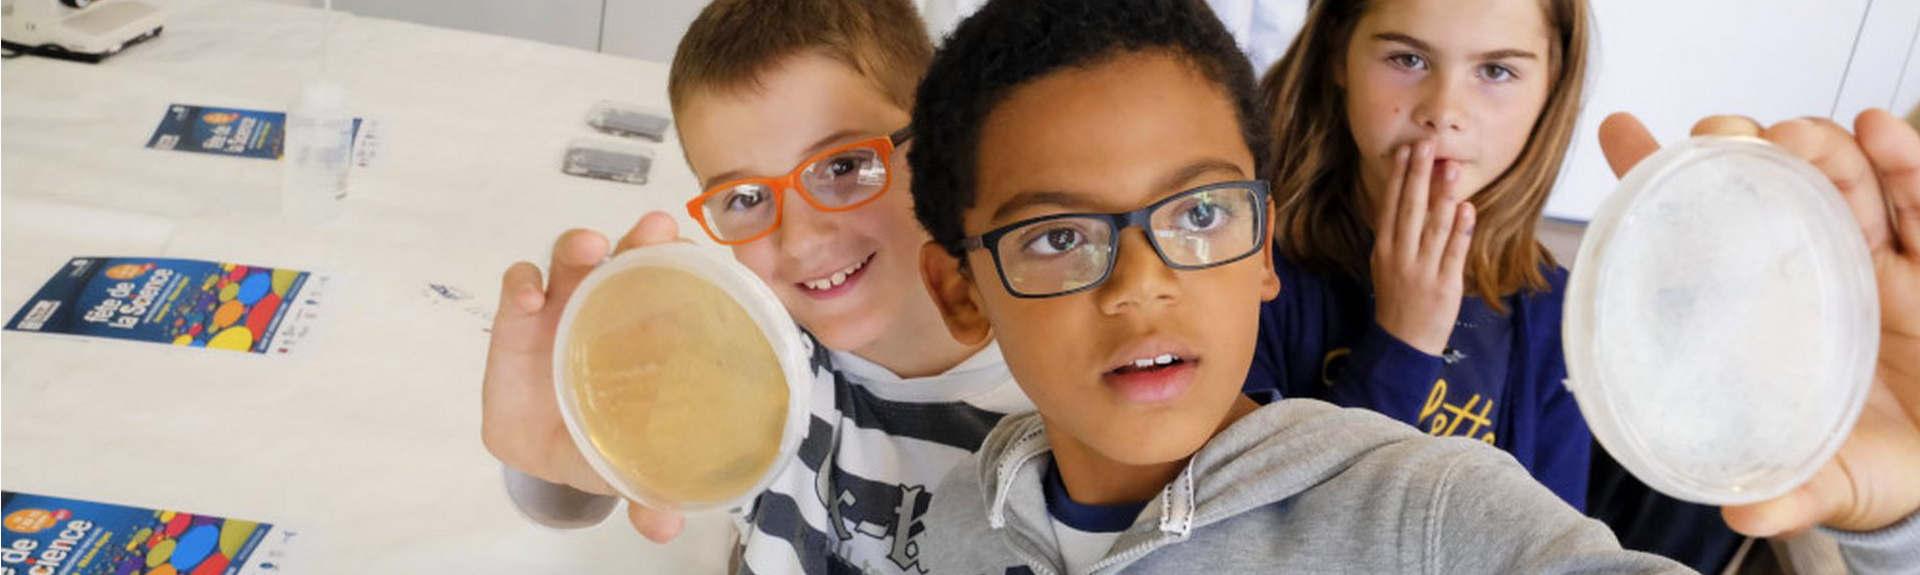 header-enfants-fete-science-petri